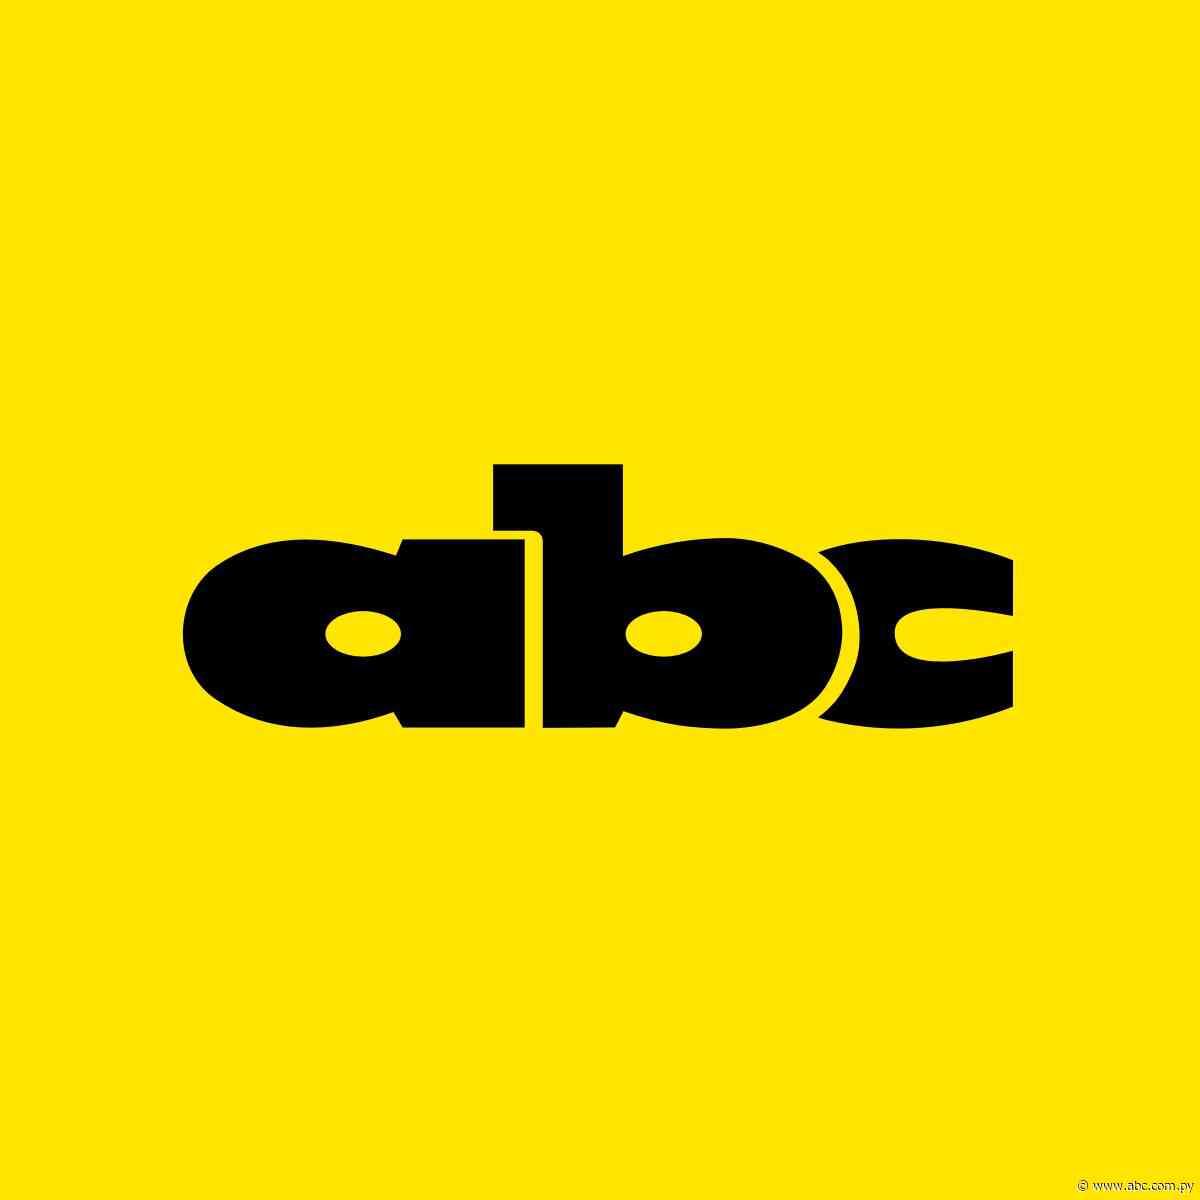 Paralizan investigación en Ñacunday - Nacionales - ABC Color